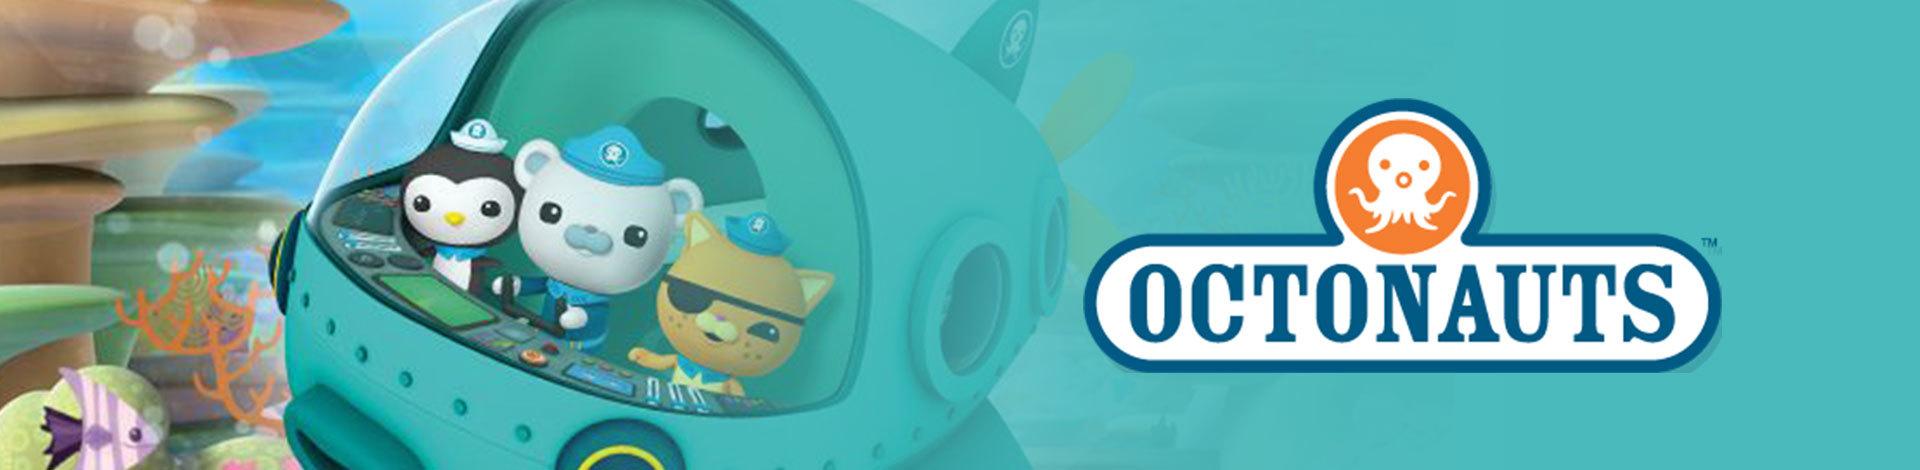 Preschool - Octonauts - Toymate